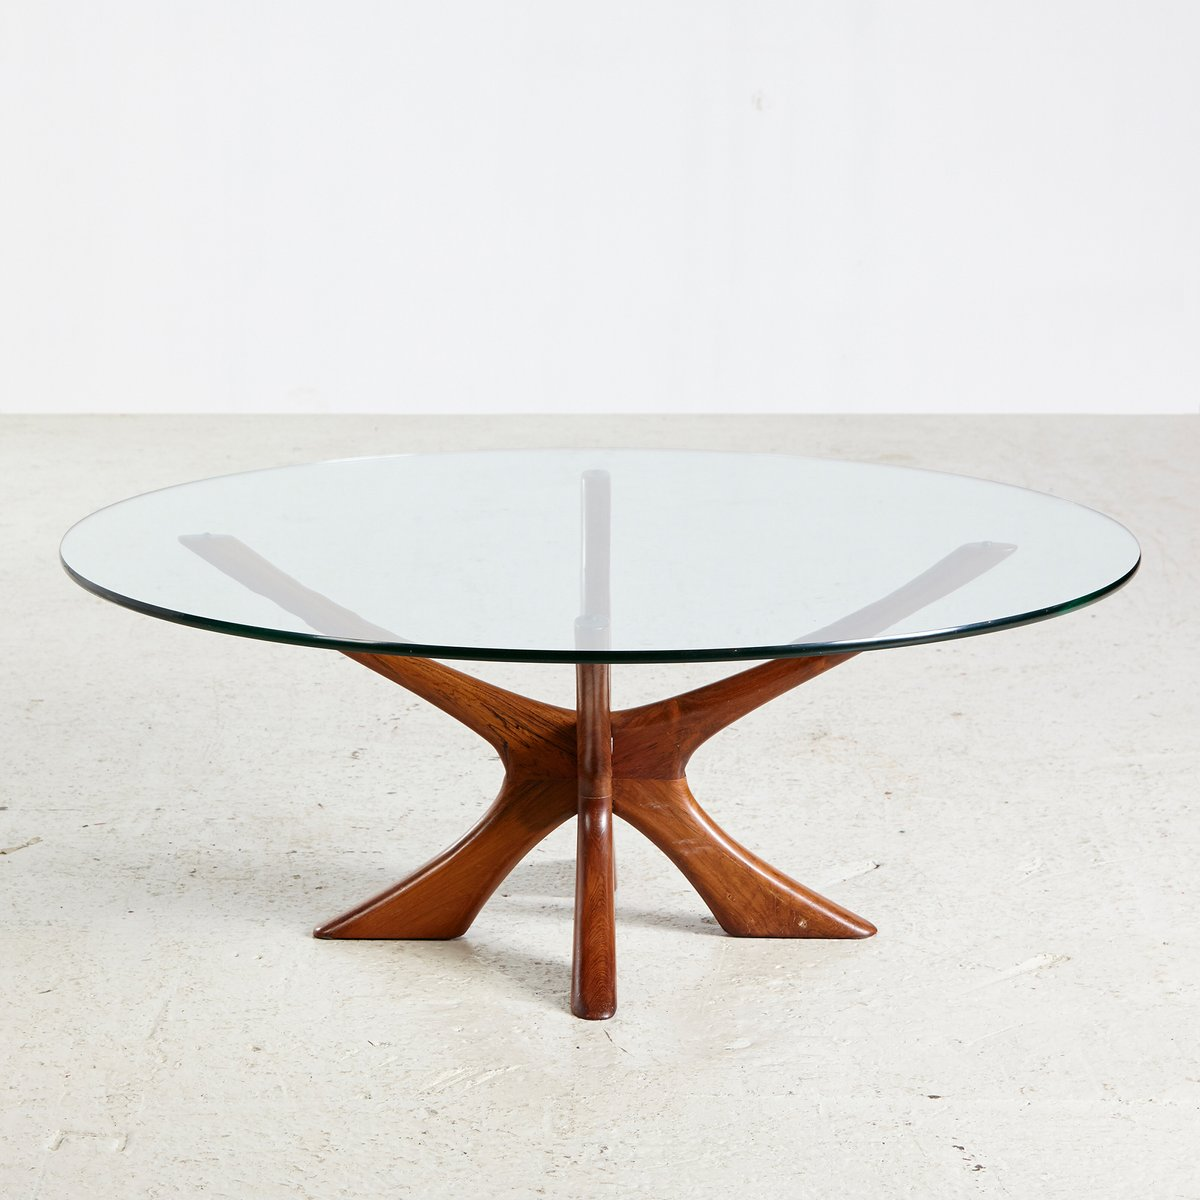 Teak Atomic Coffee Table: JAX Teak Coffee Table By Illum Wikkelso For Niels Eilersen